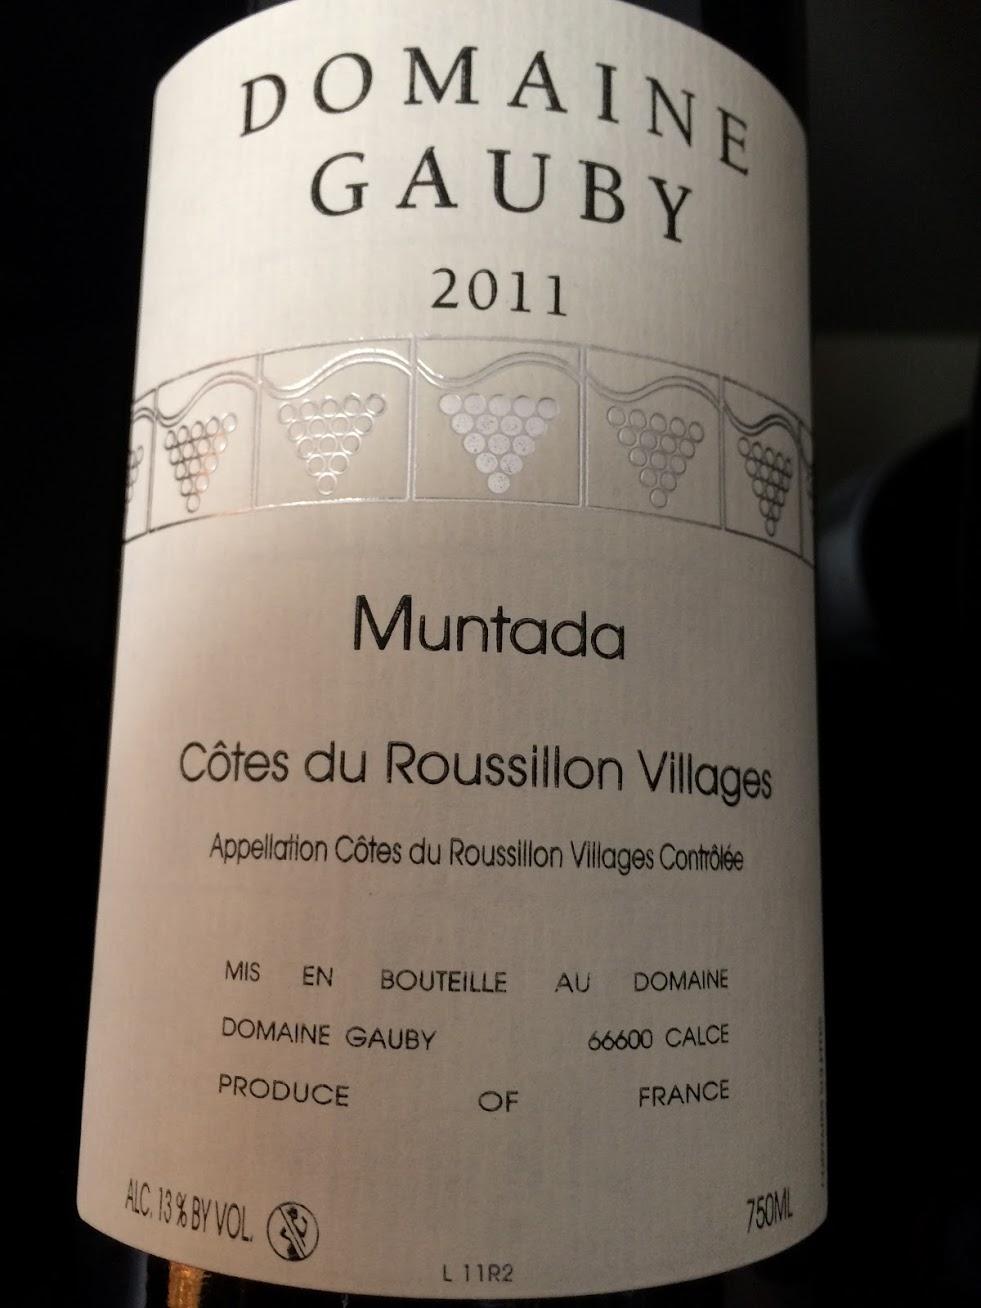 Domaine Gauby - Muntada - 2011 - Rouge